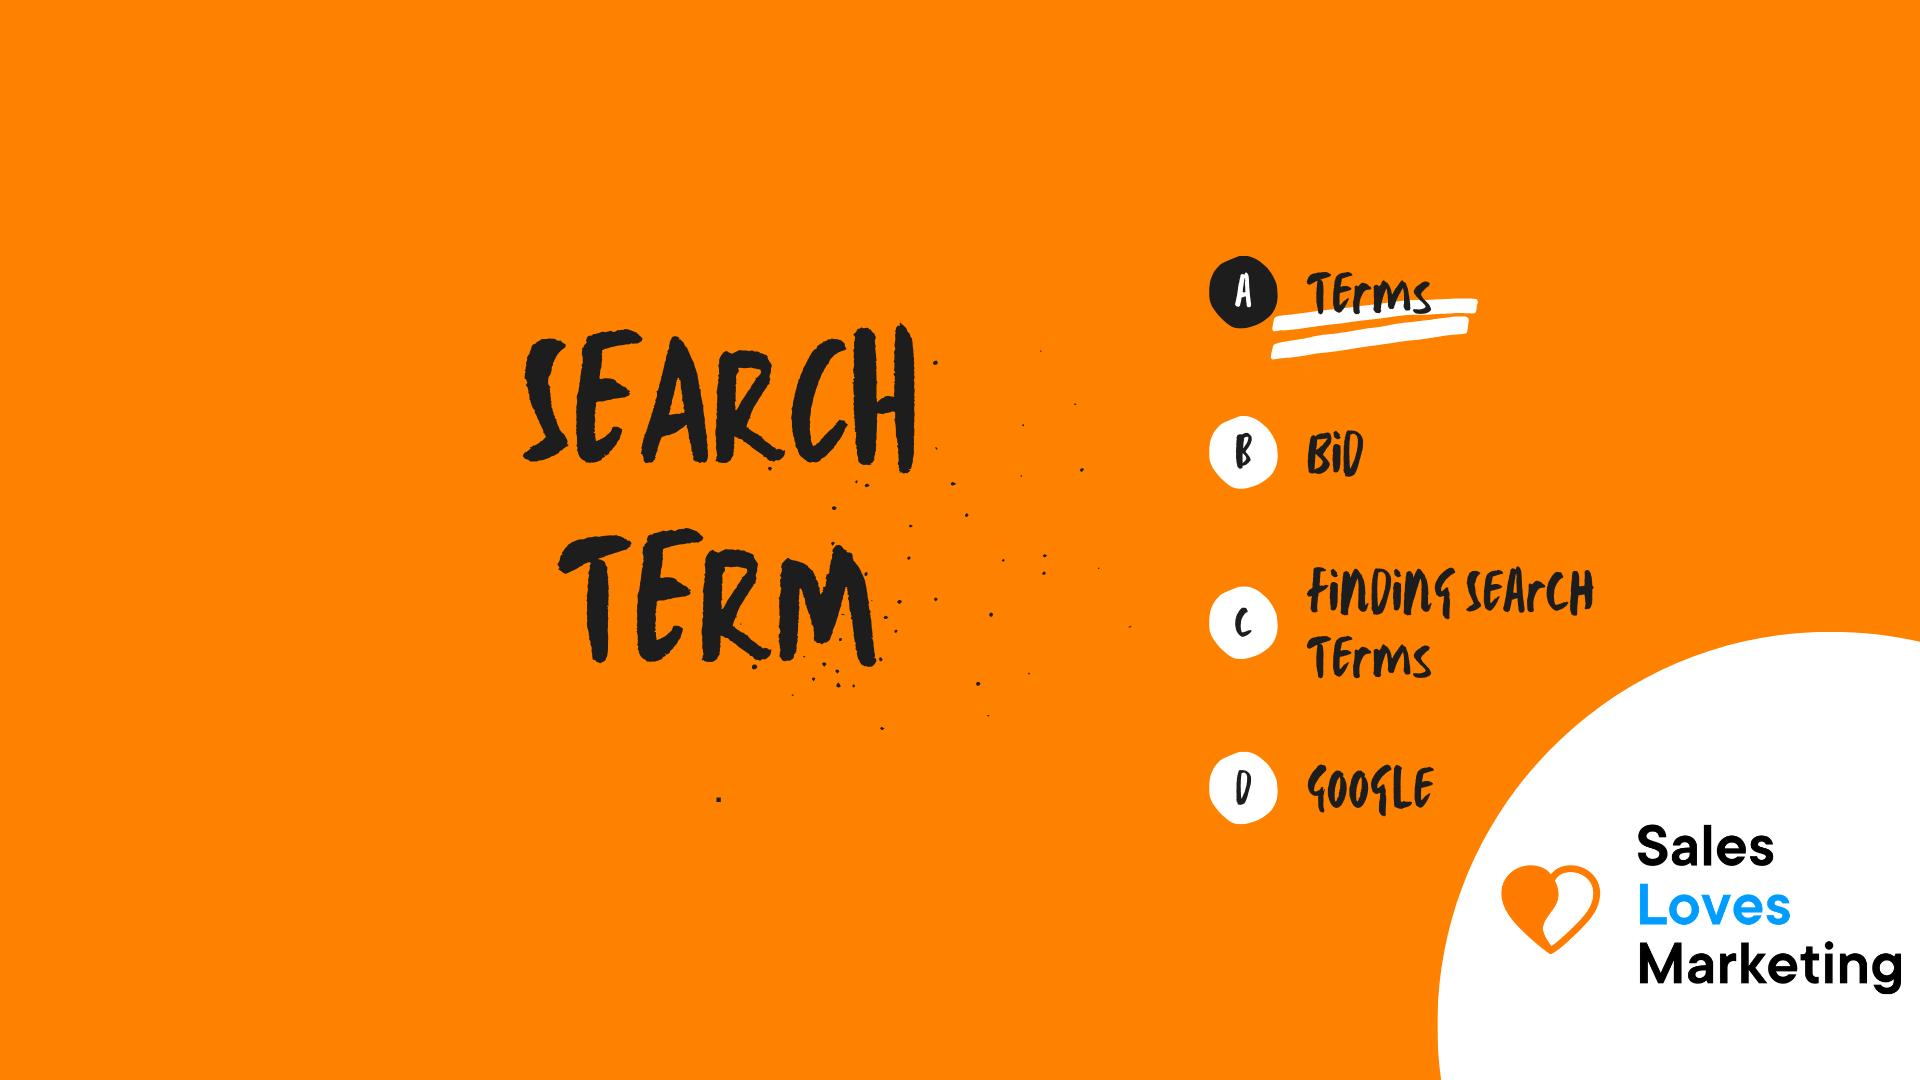 Search Term